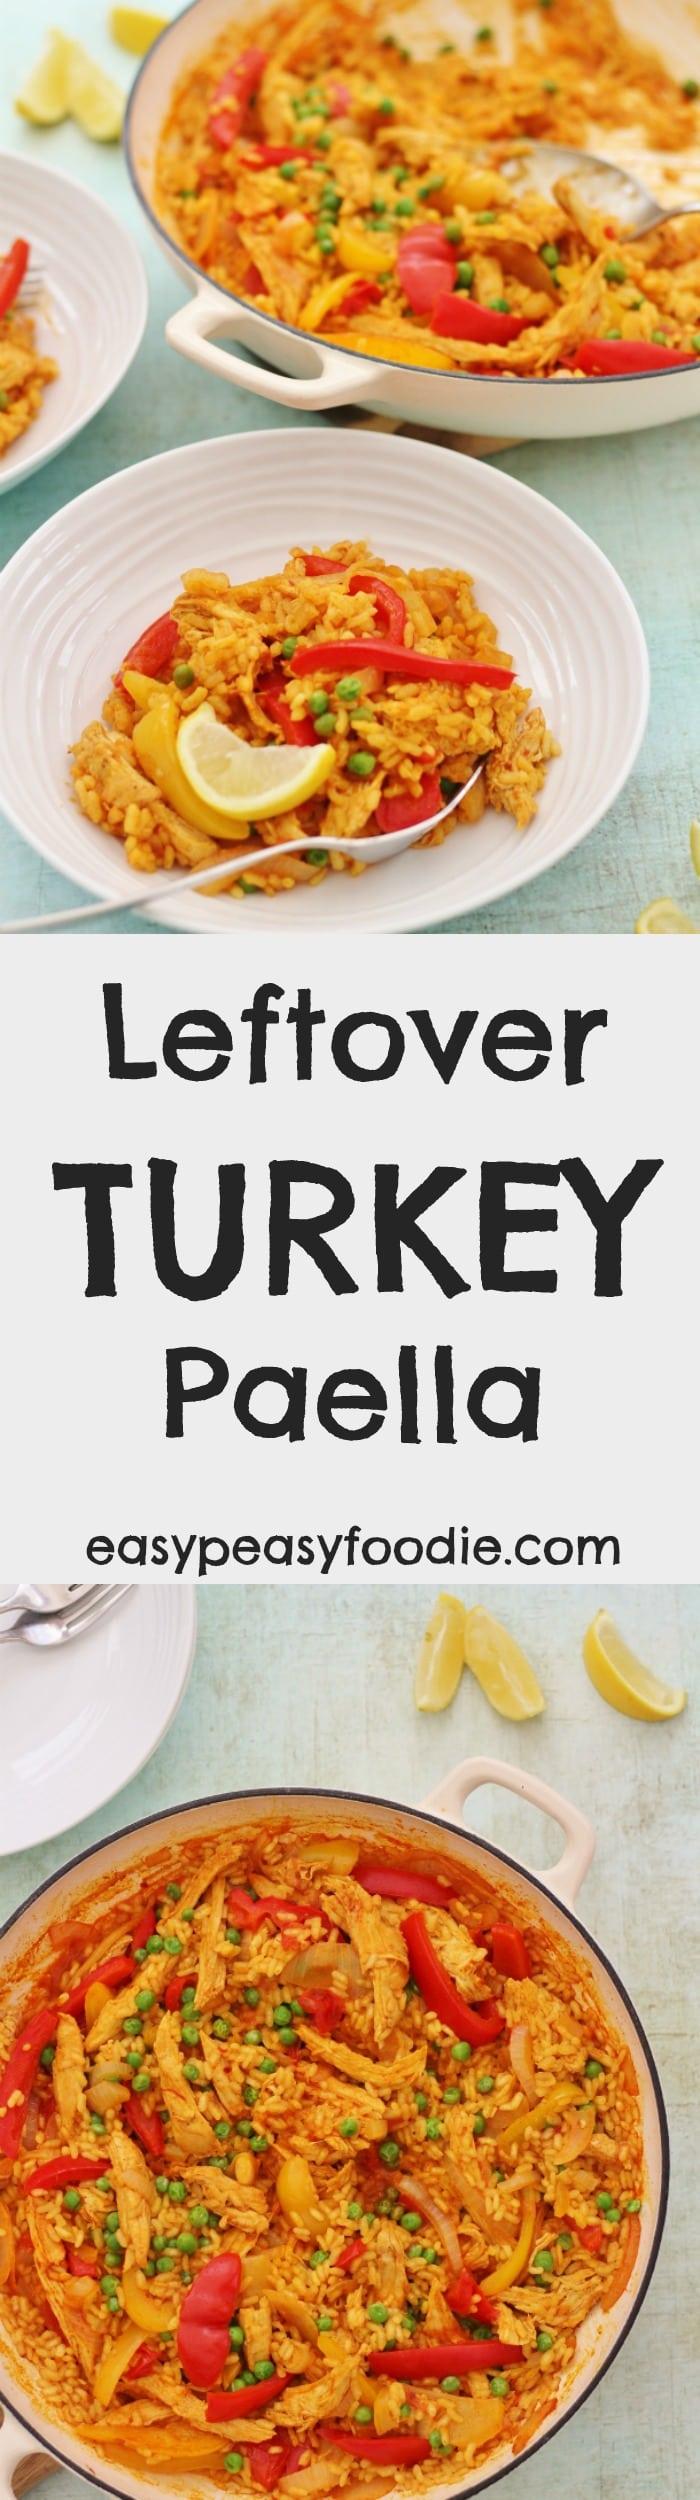 Leftover Turkey Paella - pinnable image for Pinterest